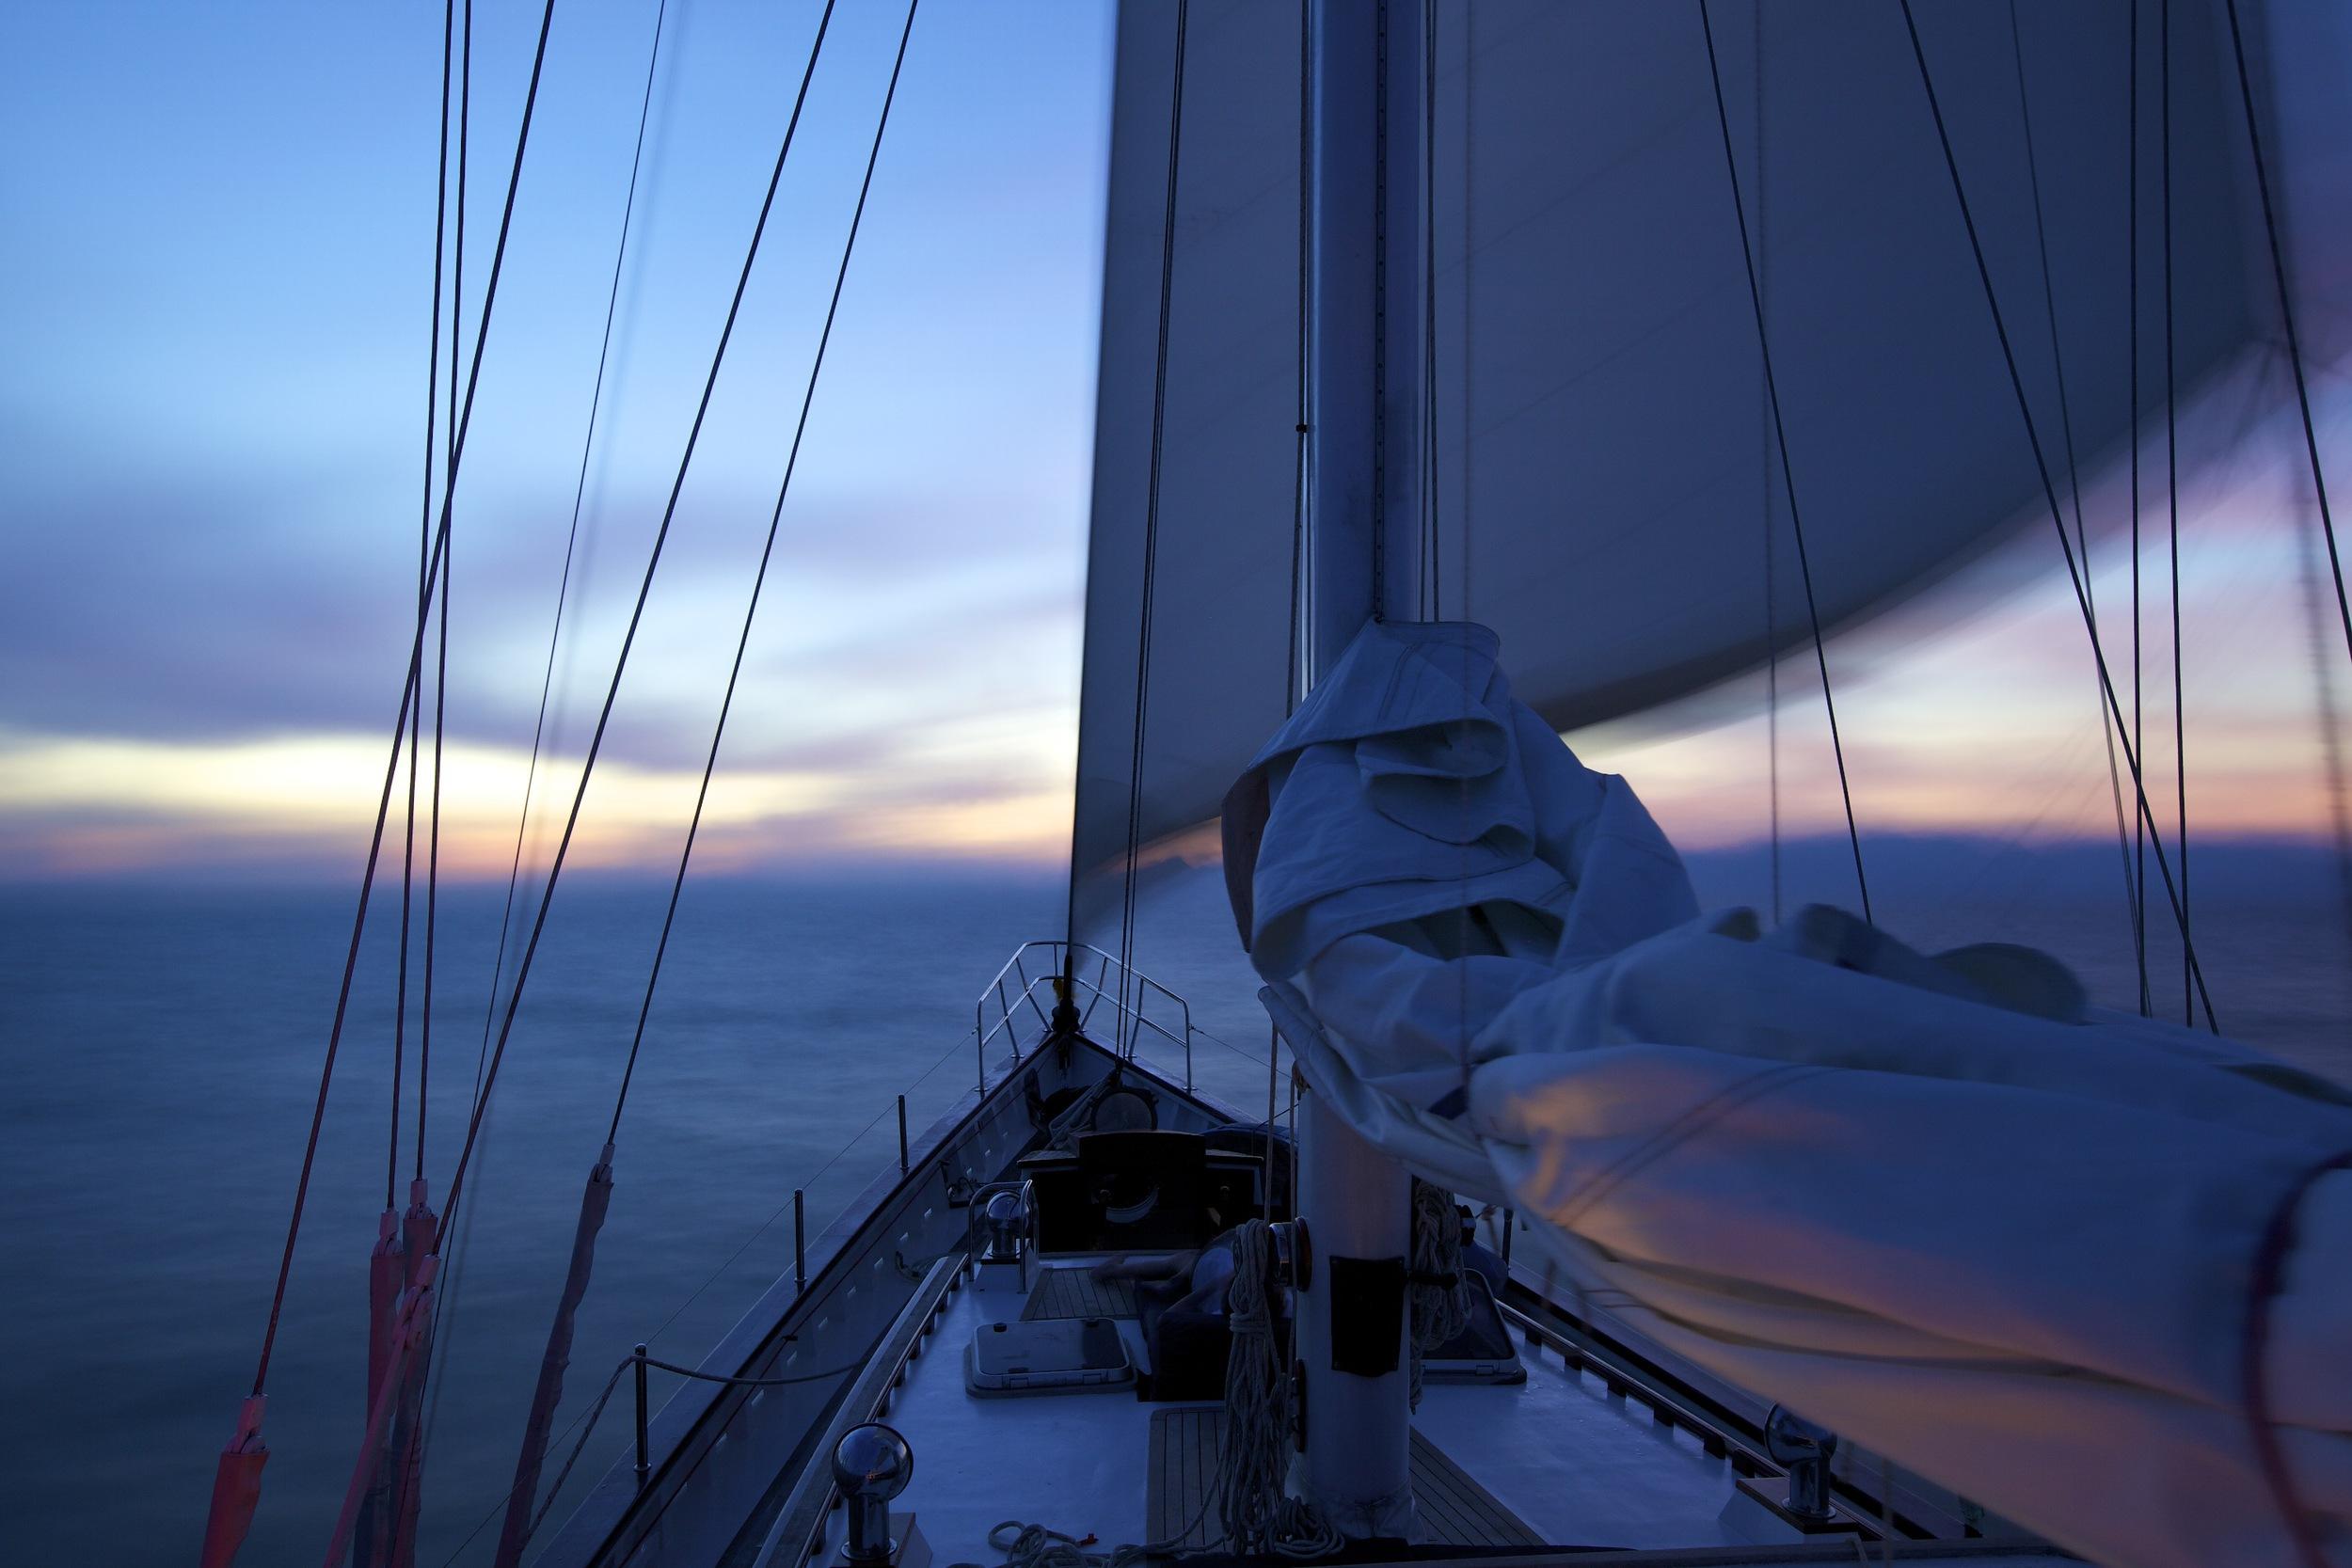 Sailing at sunrise